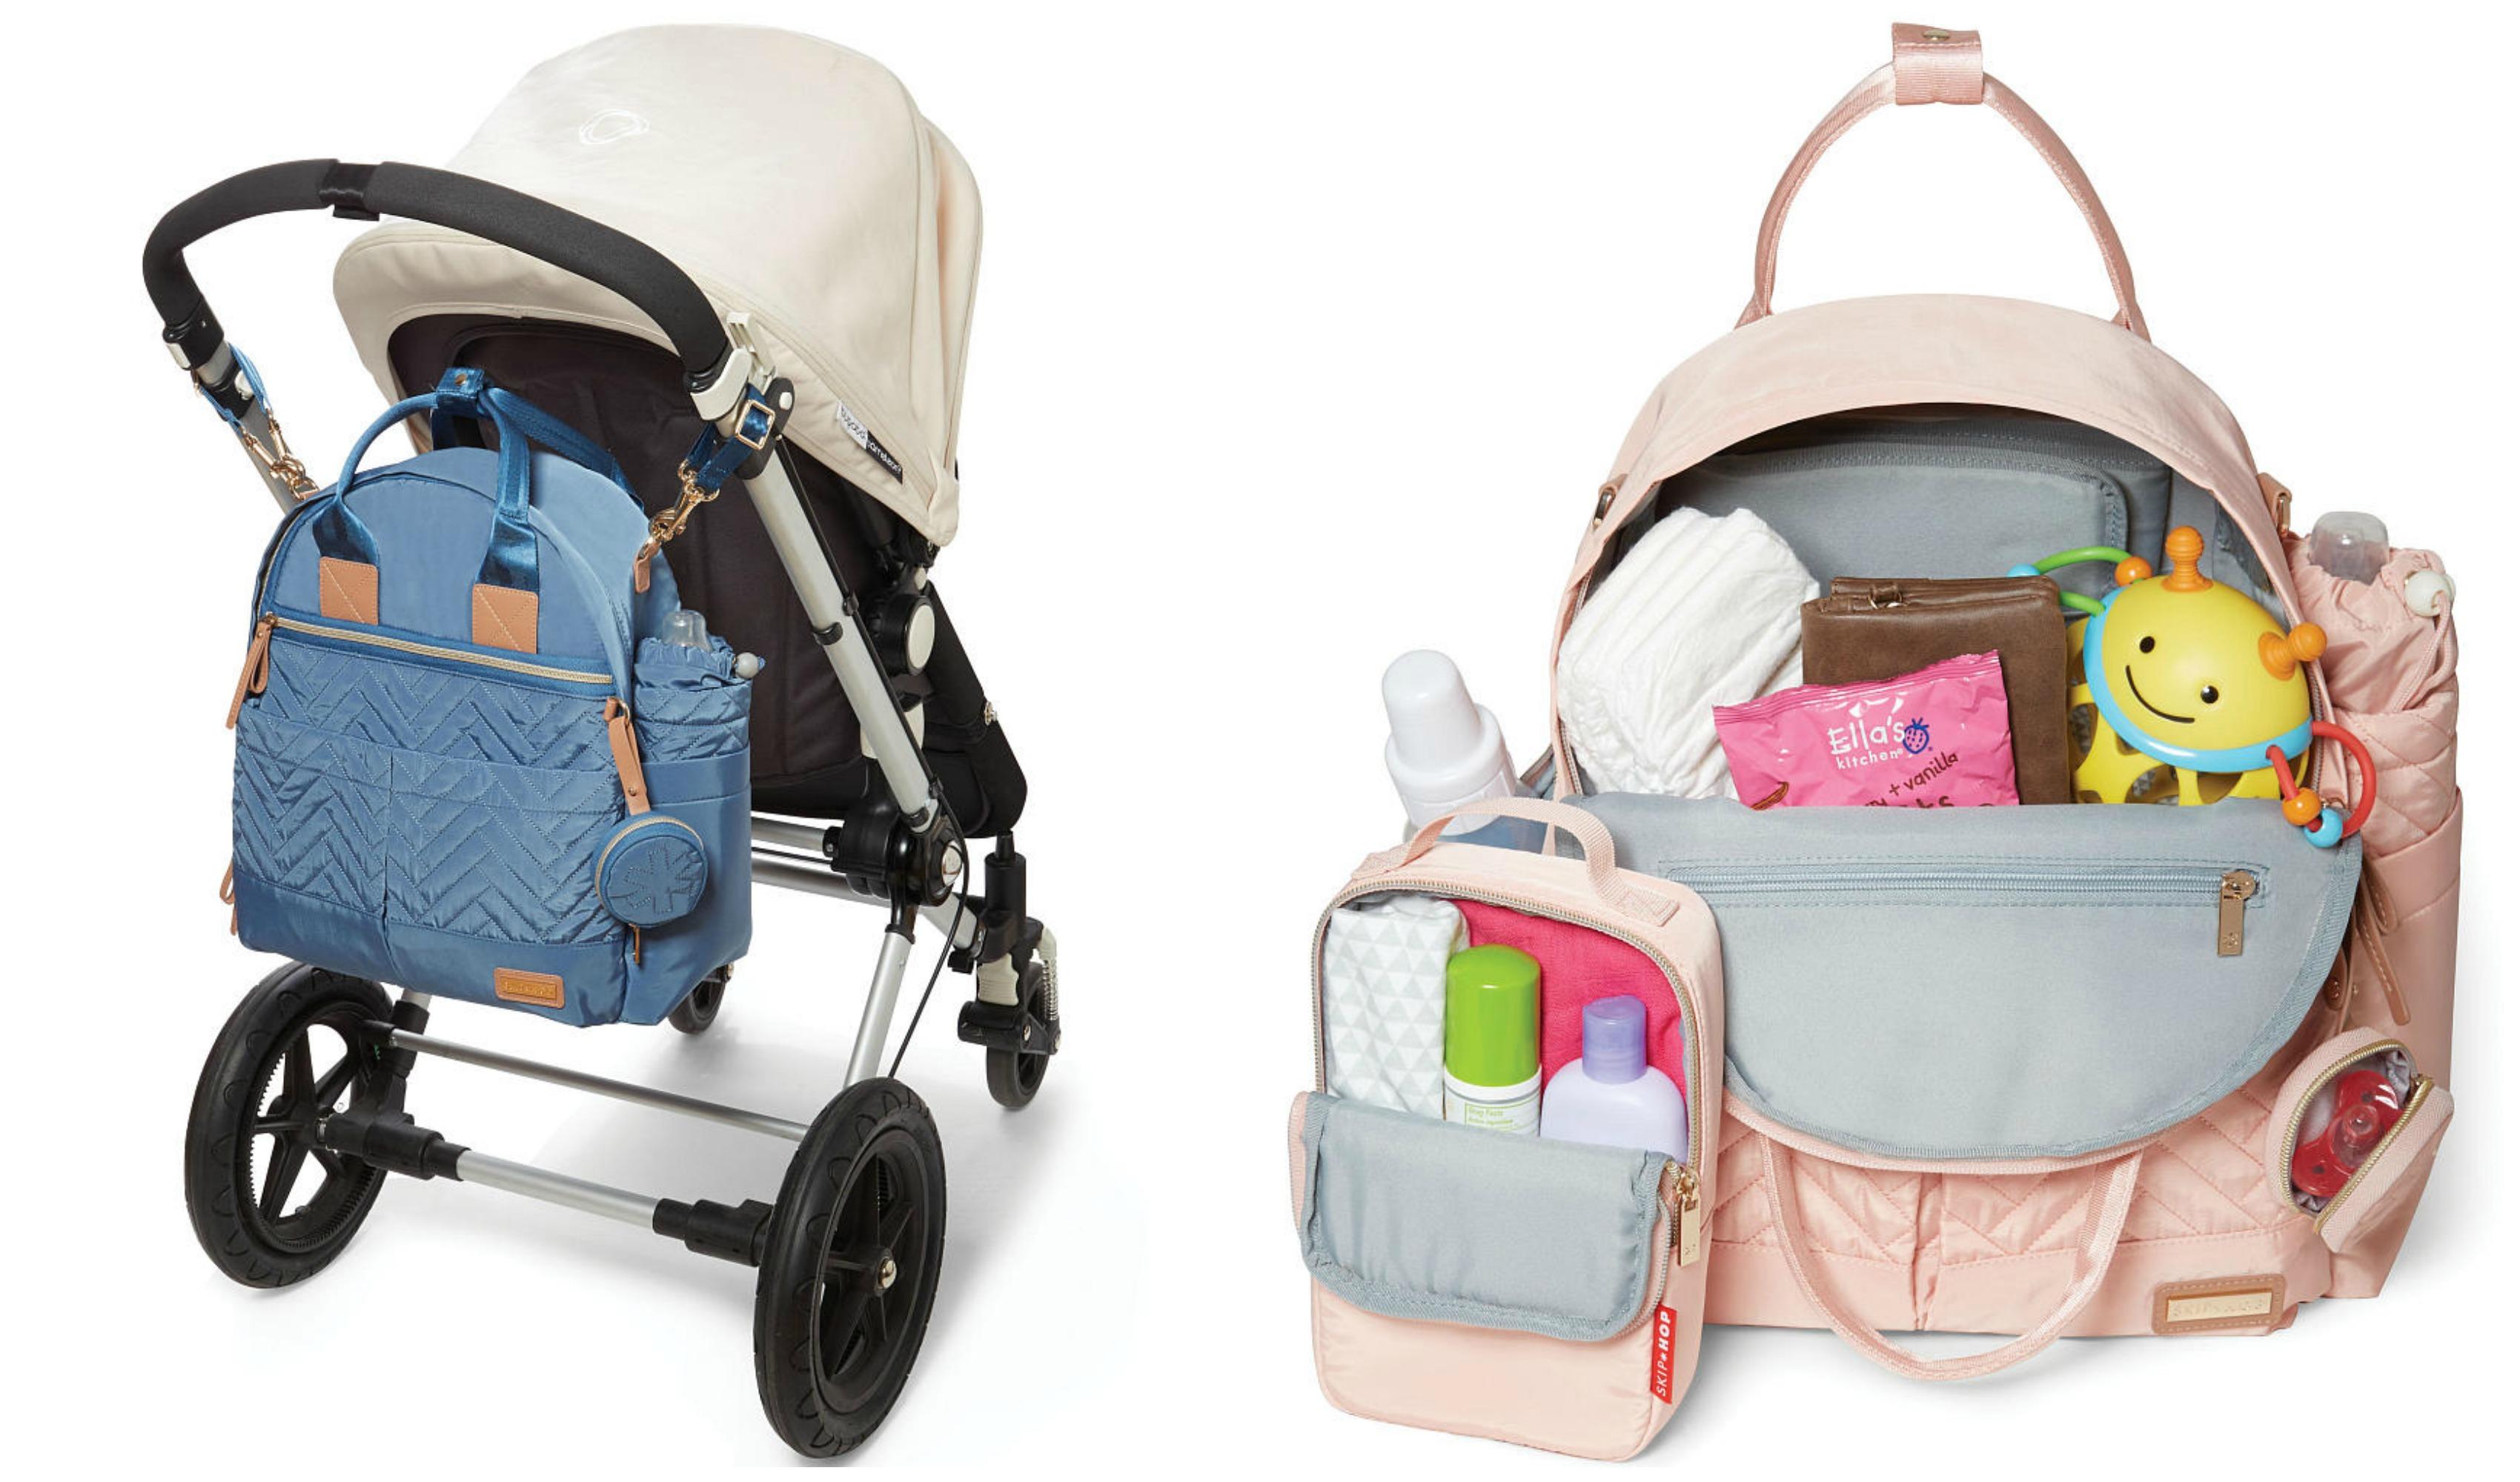 wanderlust must suite by skip hop 6 in 1 diaper backpack set gugu guru blog. Black Bedroom Furniture Sets. Home Design Ideas